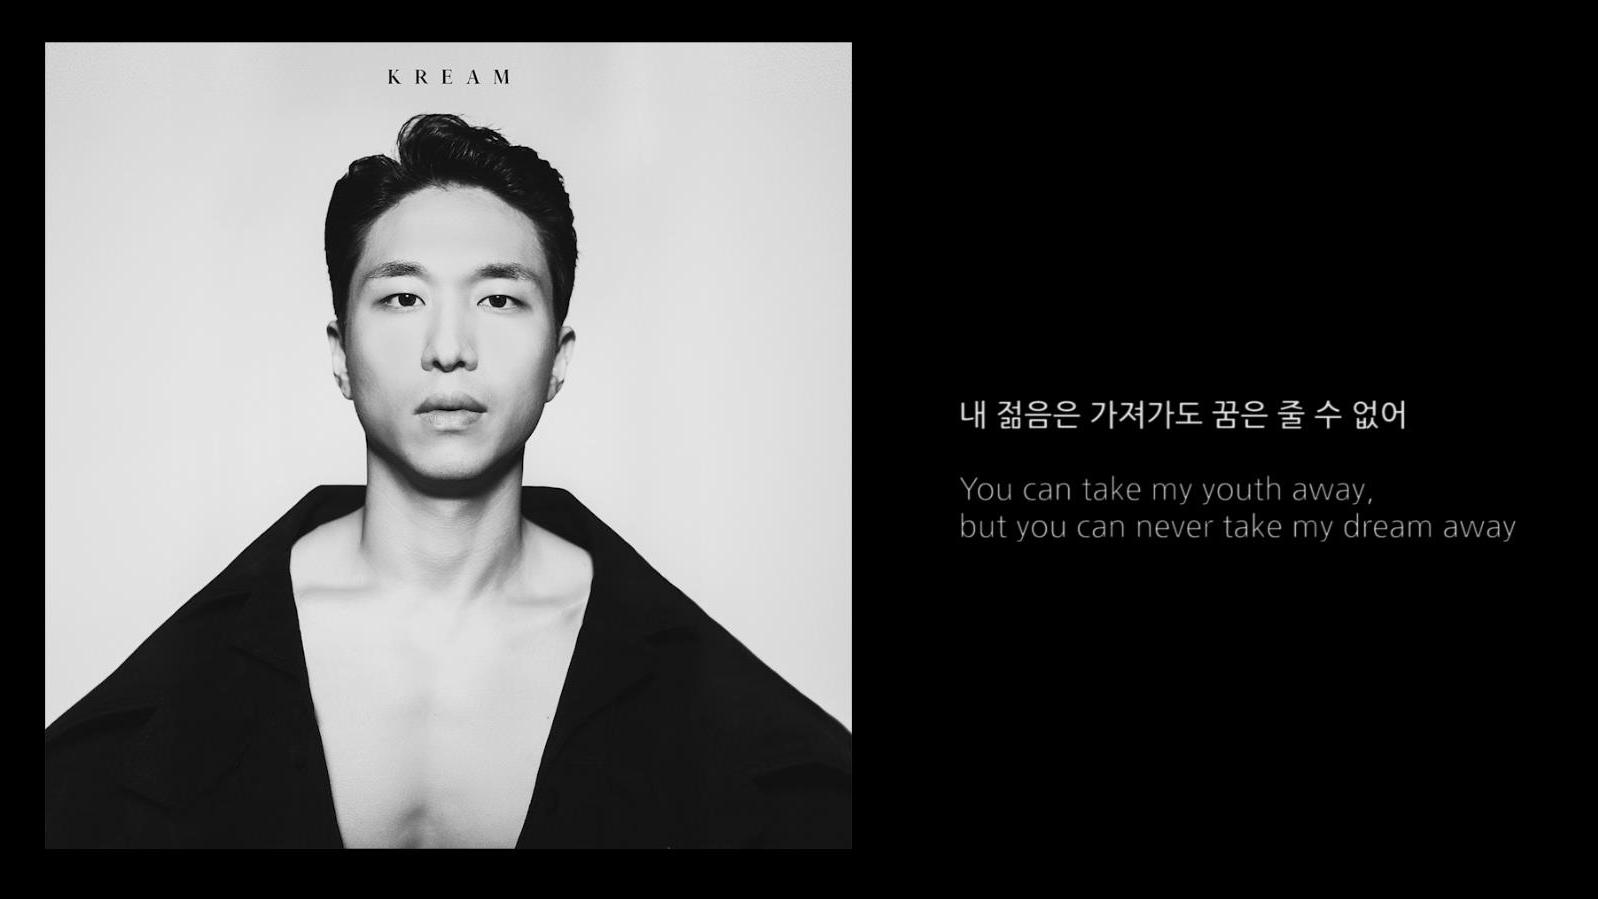 [MV] 크림 (KREAM) – 내 젊음은 가져가도 꿈은 줄 수 없어